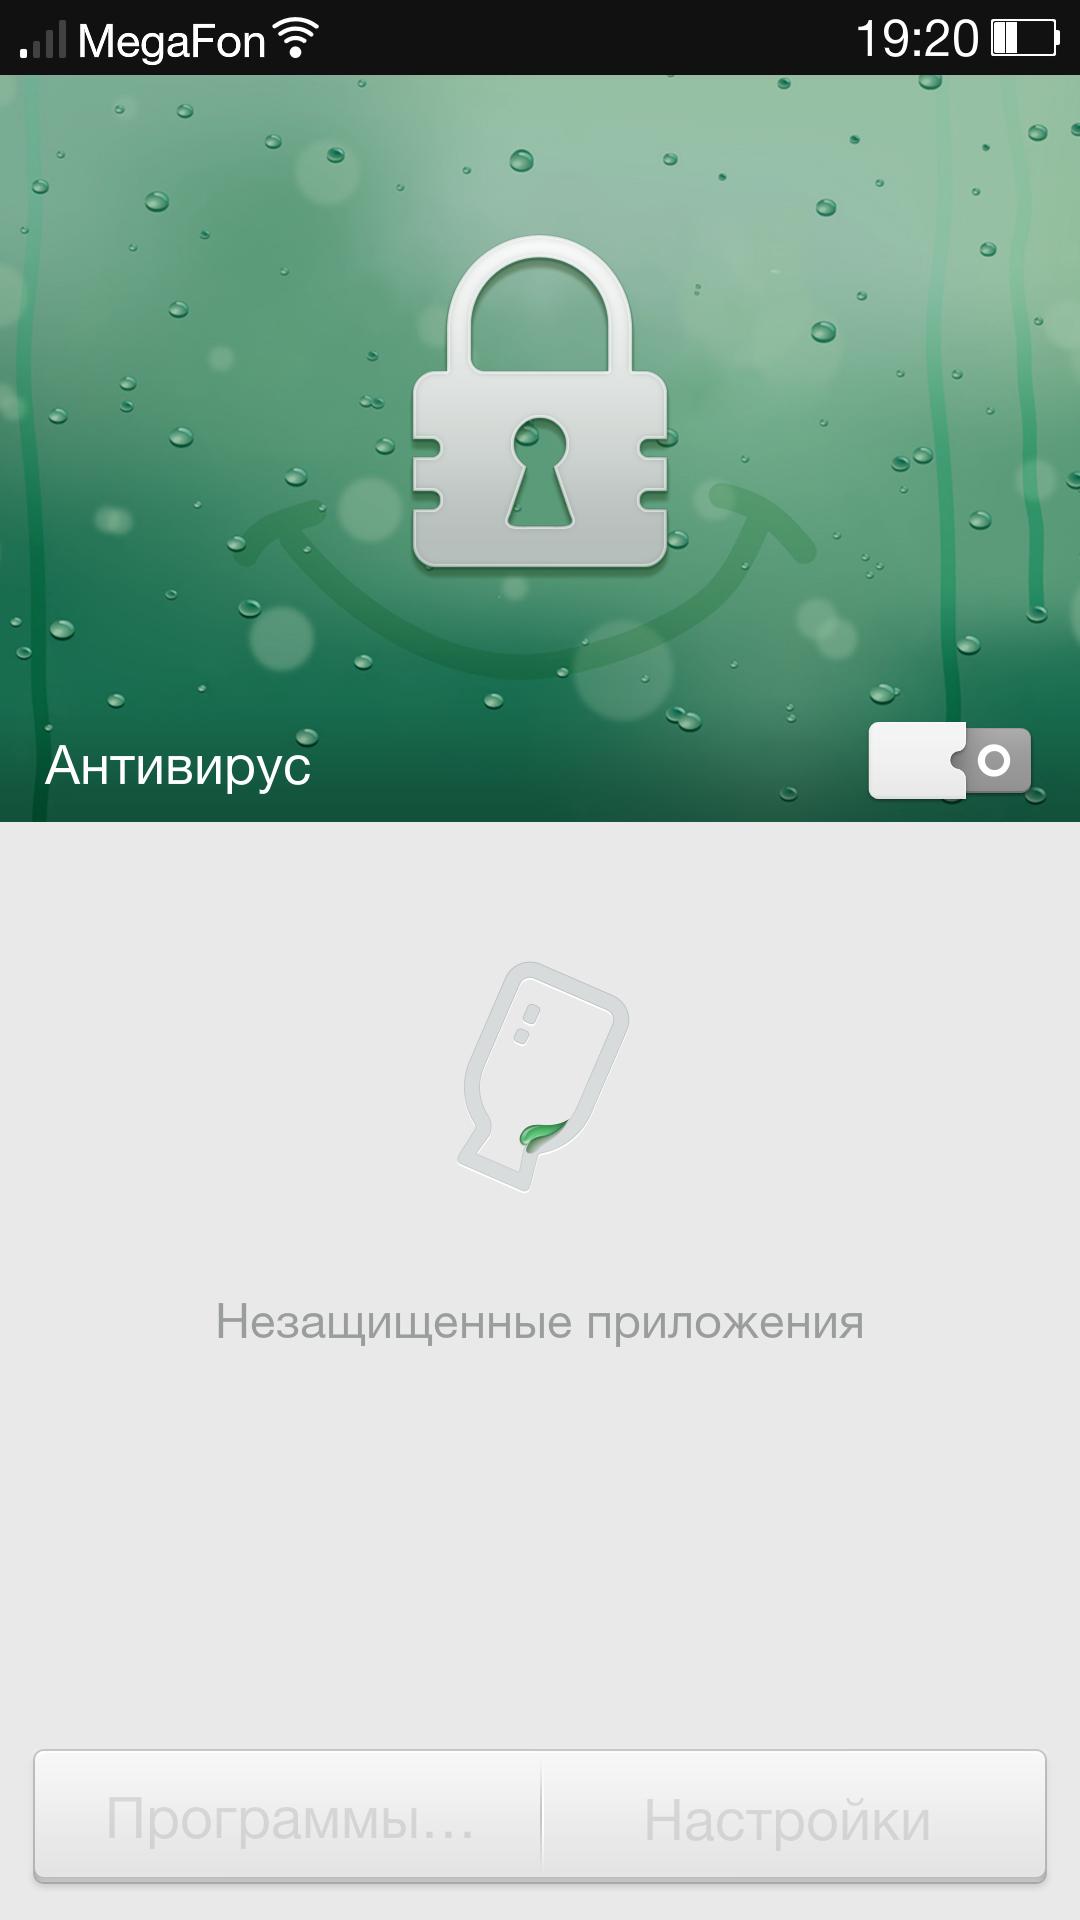 Screenshot_2013-10-26-19-20-43